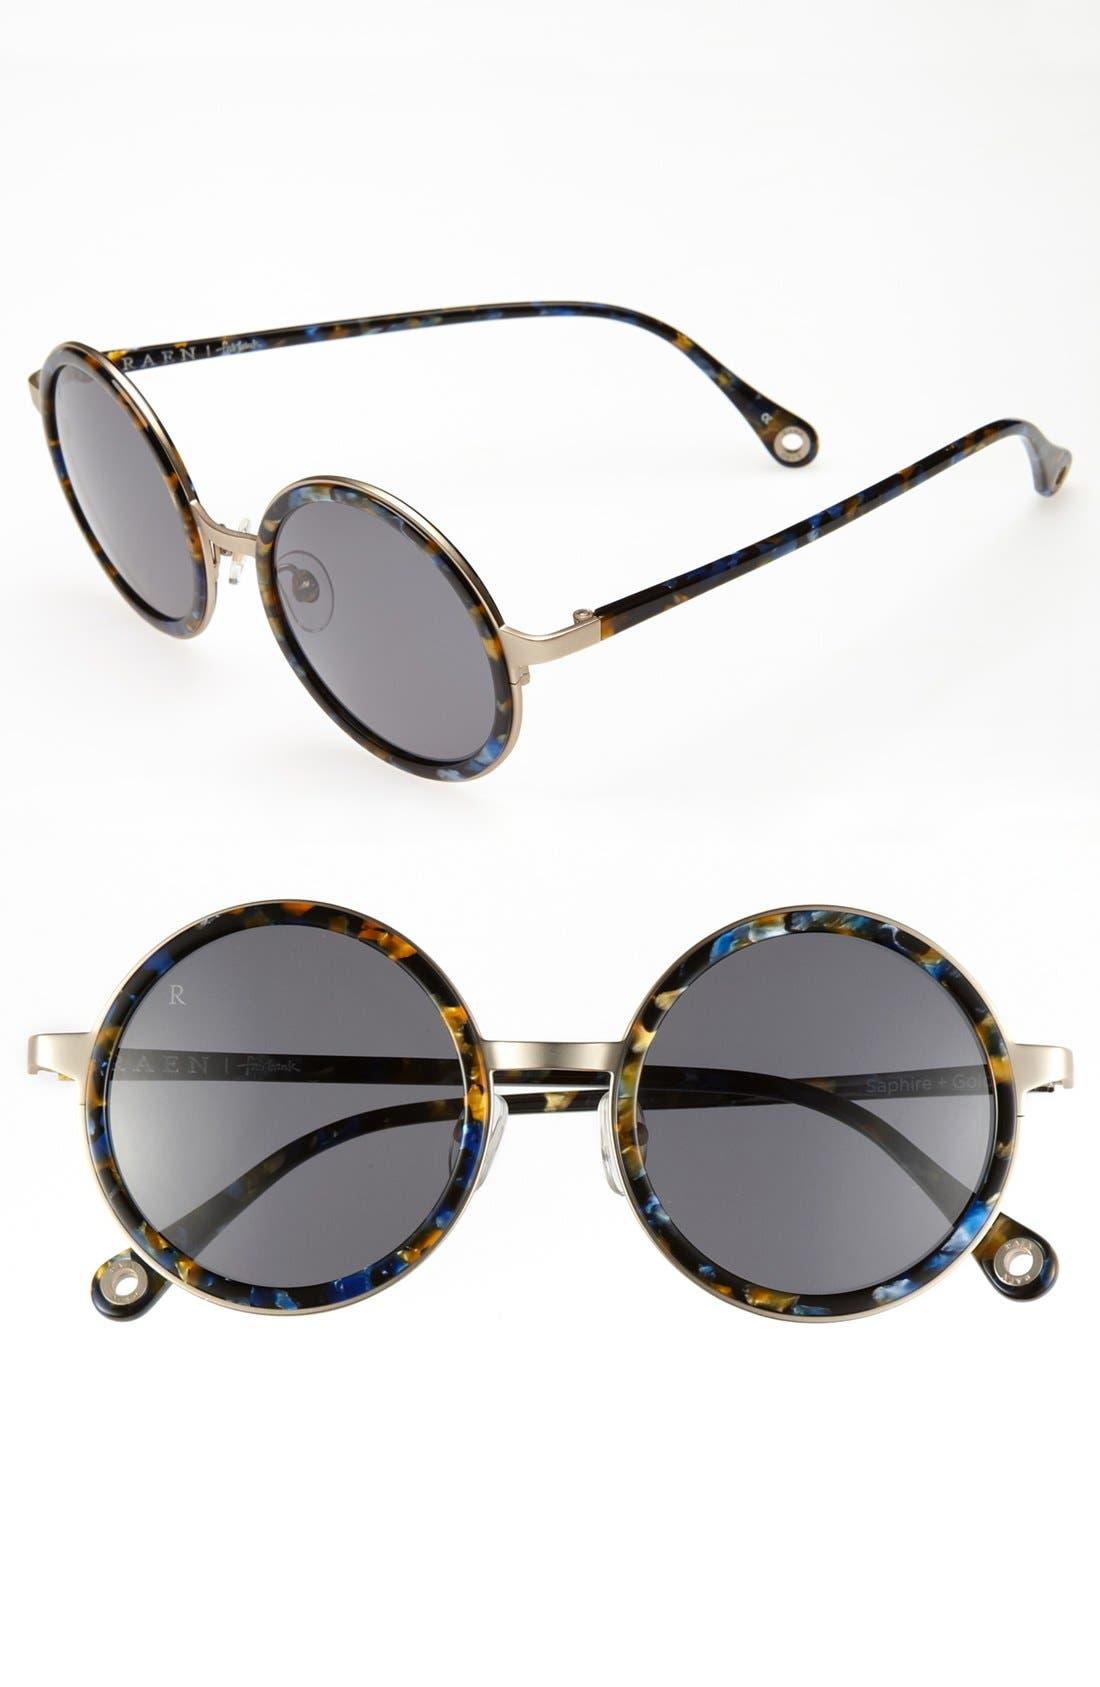 Main Image - RAEN 'Fairbank' Polarized Sunglasses